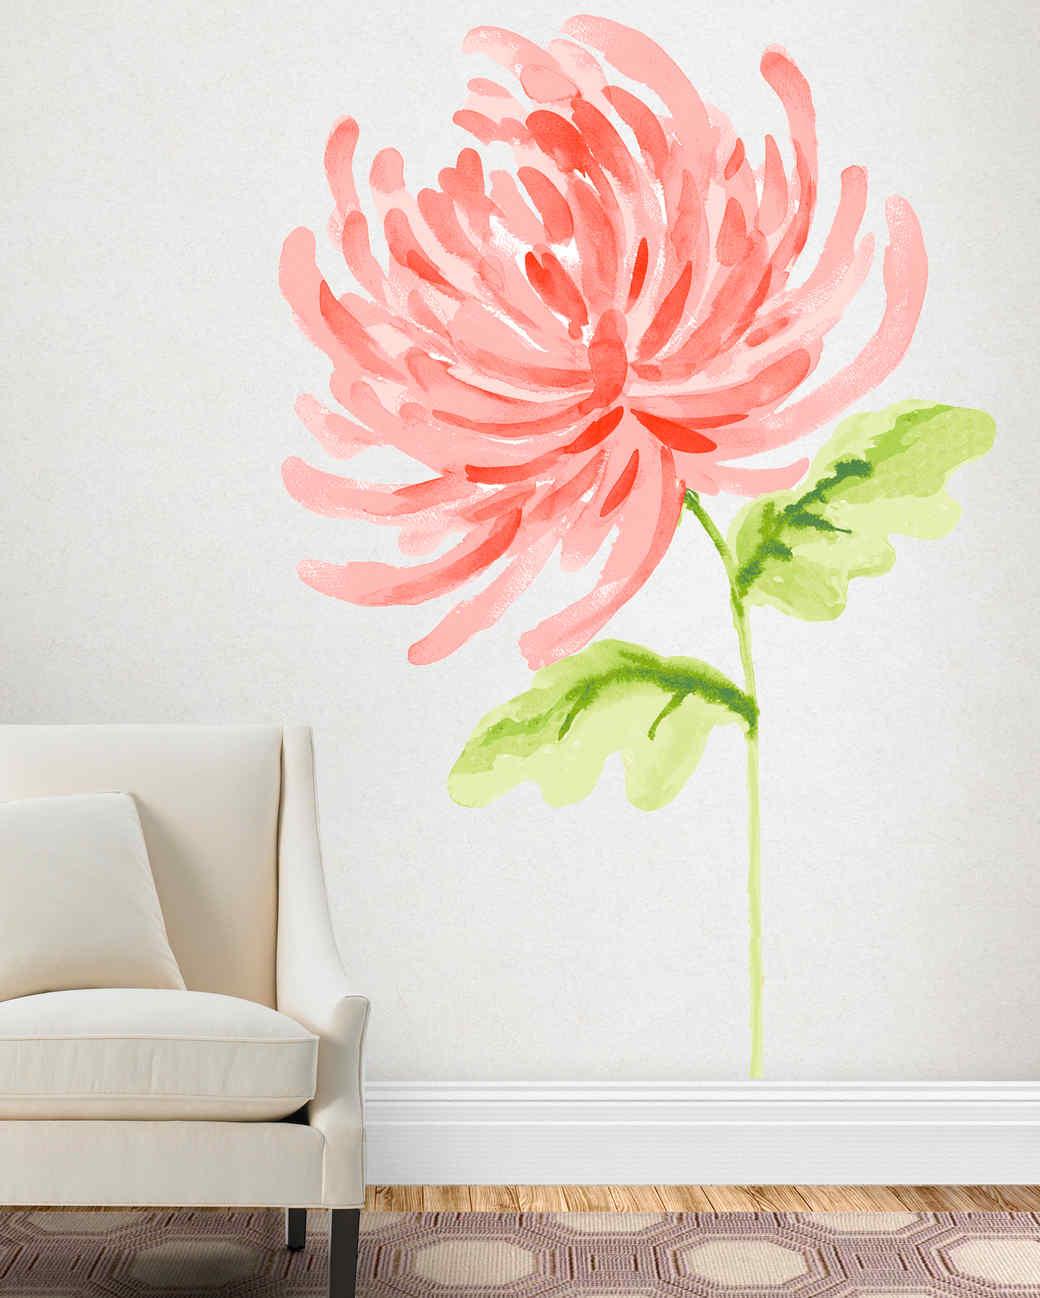 fathead-chrysanthemum-mrkt-0615.jpg